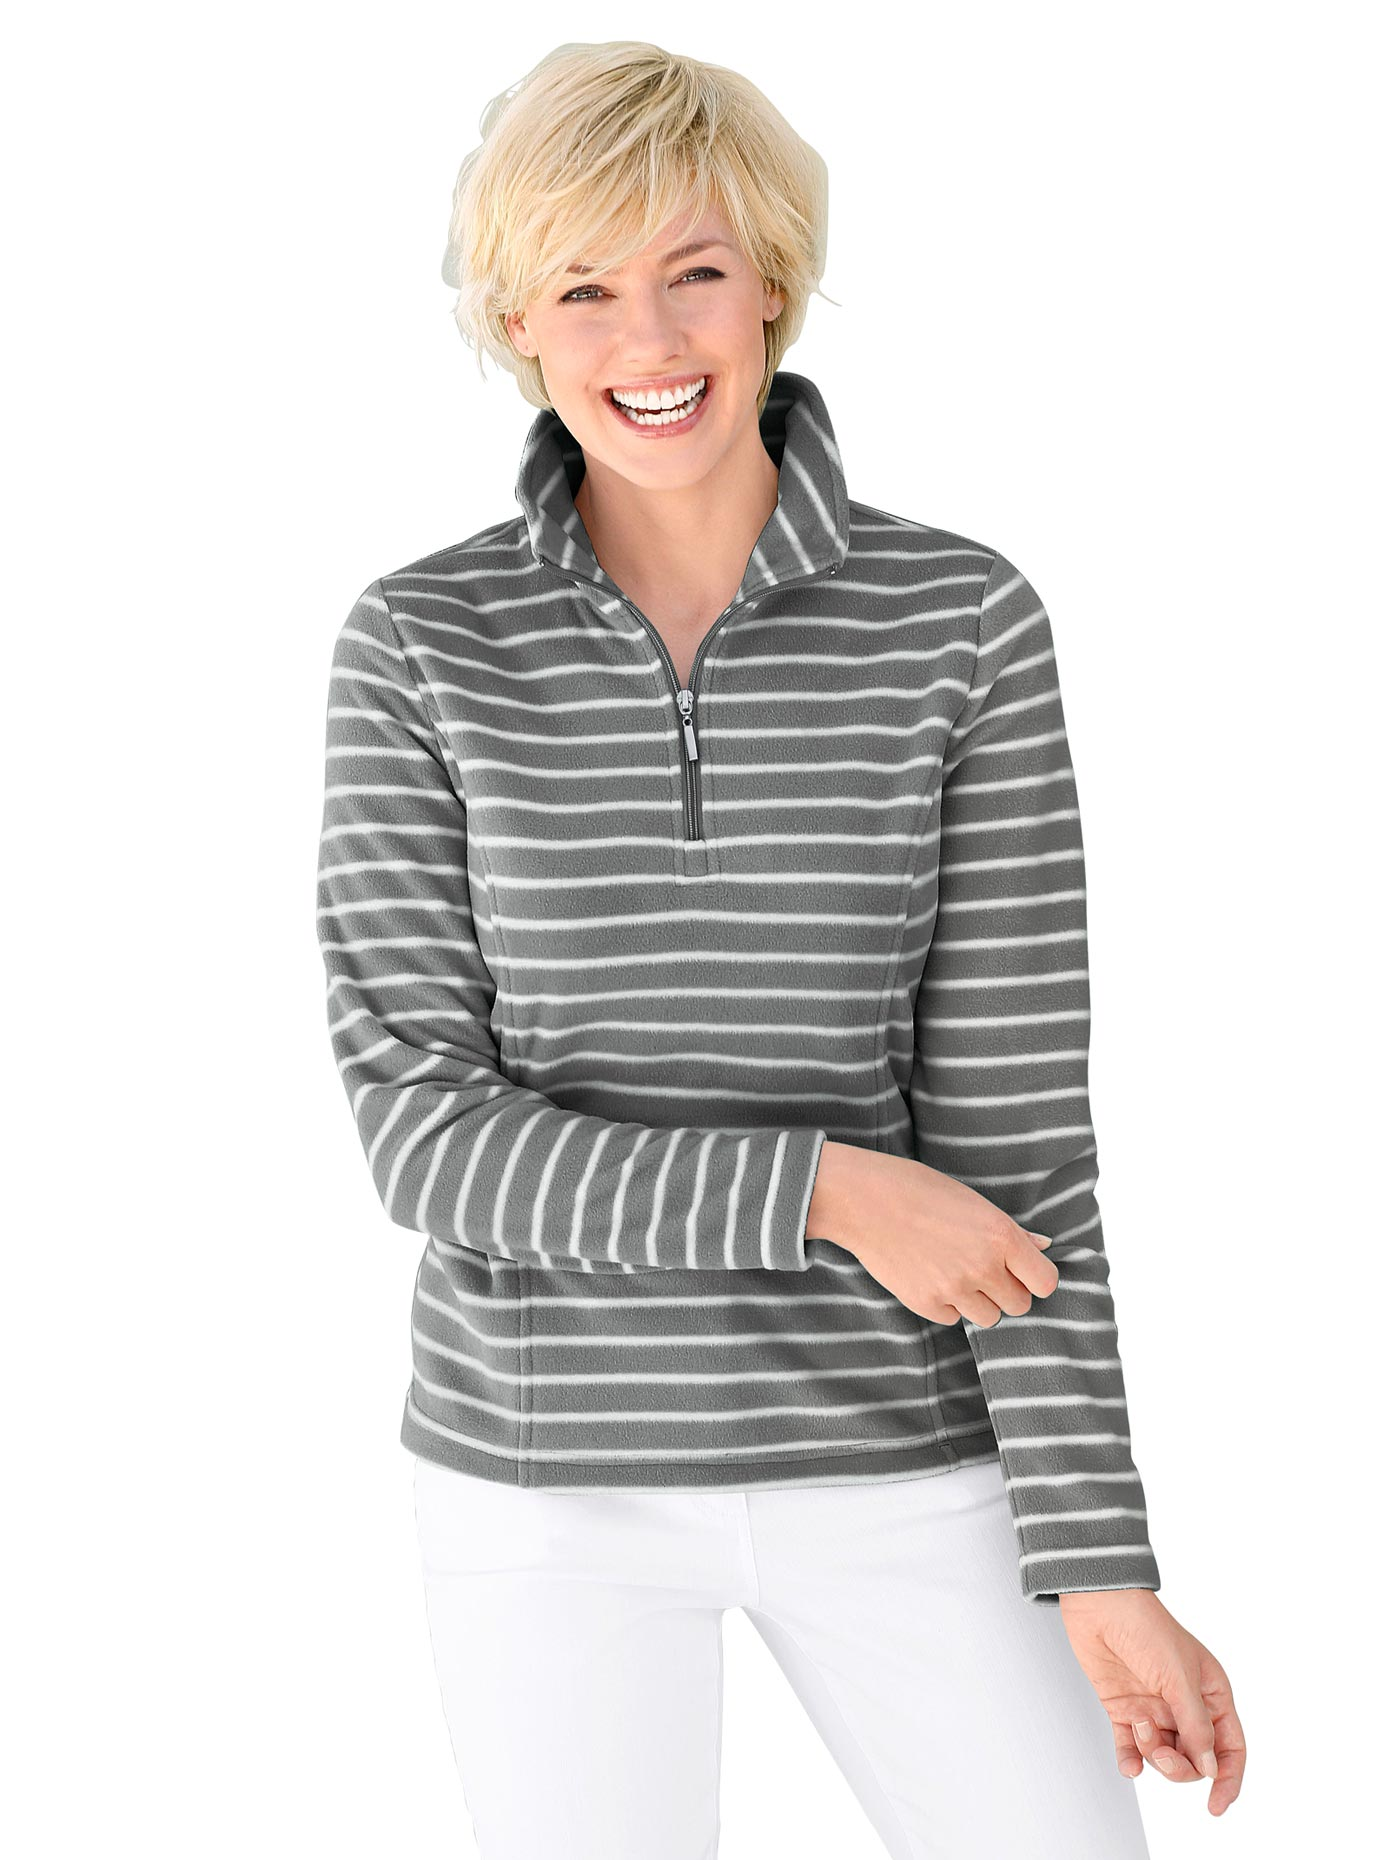 Casual Looks Fleece-Shirt mit Antipilling-Ausrüstung   Bekleidung > Sweatshirts & -jacken > Fleeceshirts   Grau   Fleece   Casual Looks